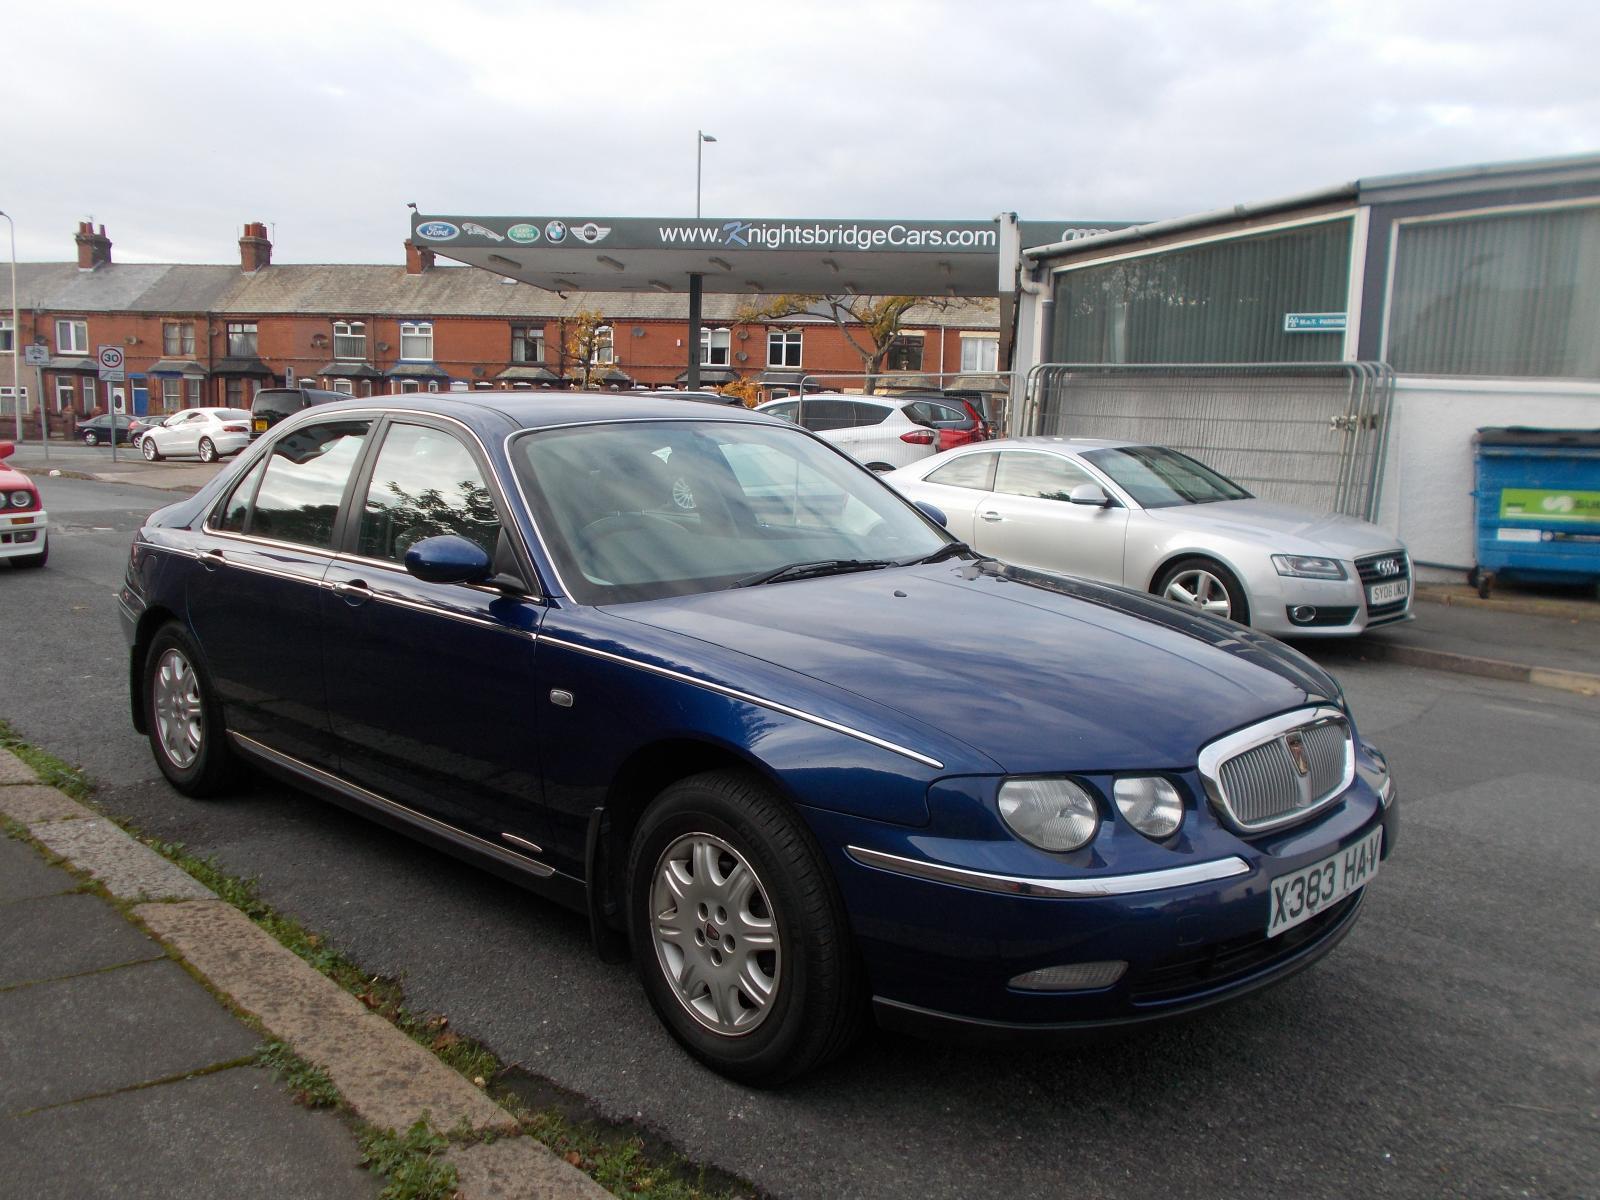 Blue Rover 006.jpg